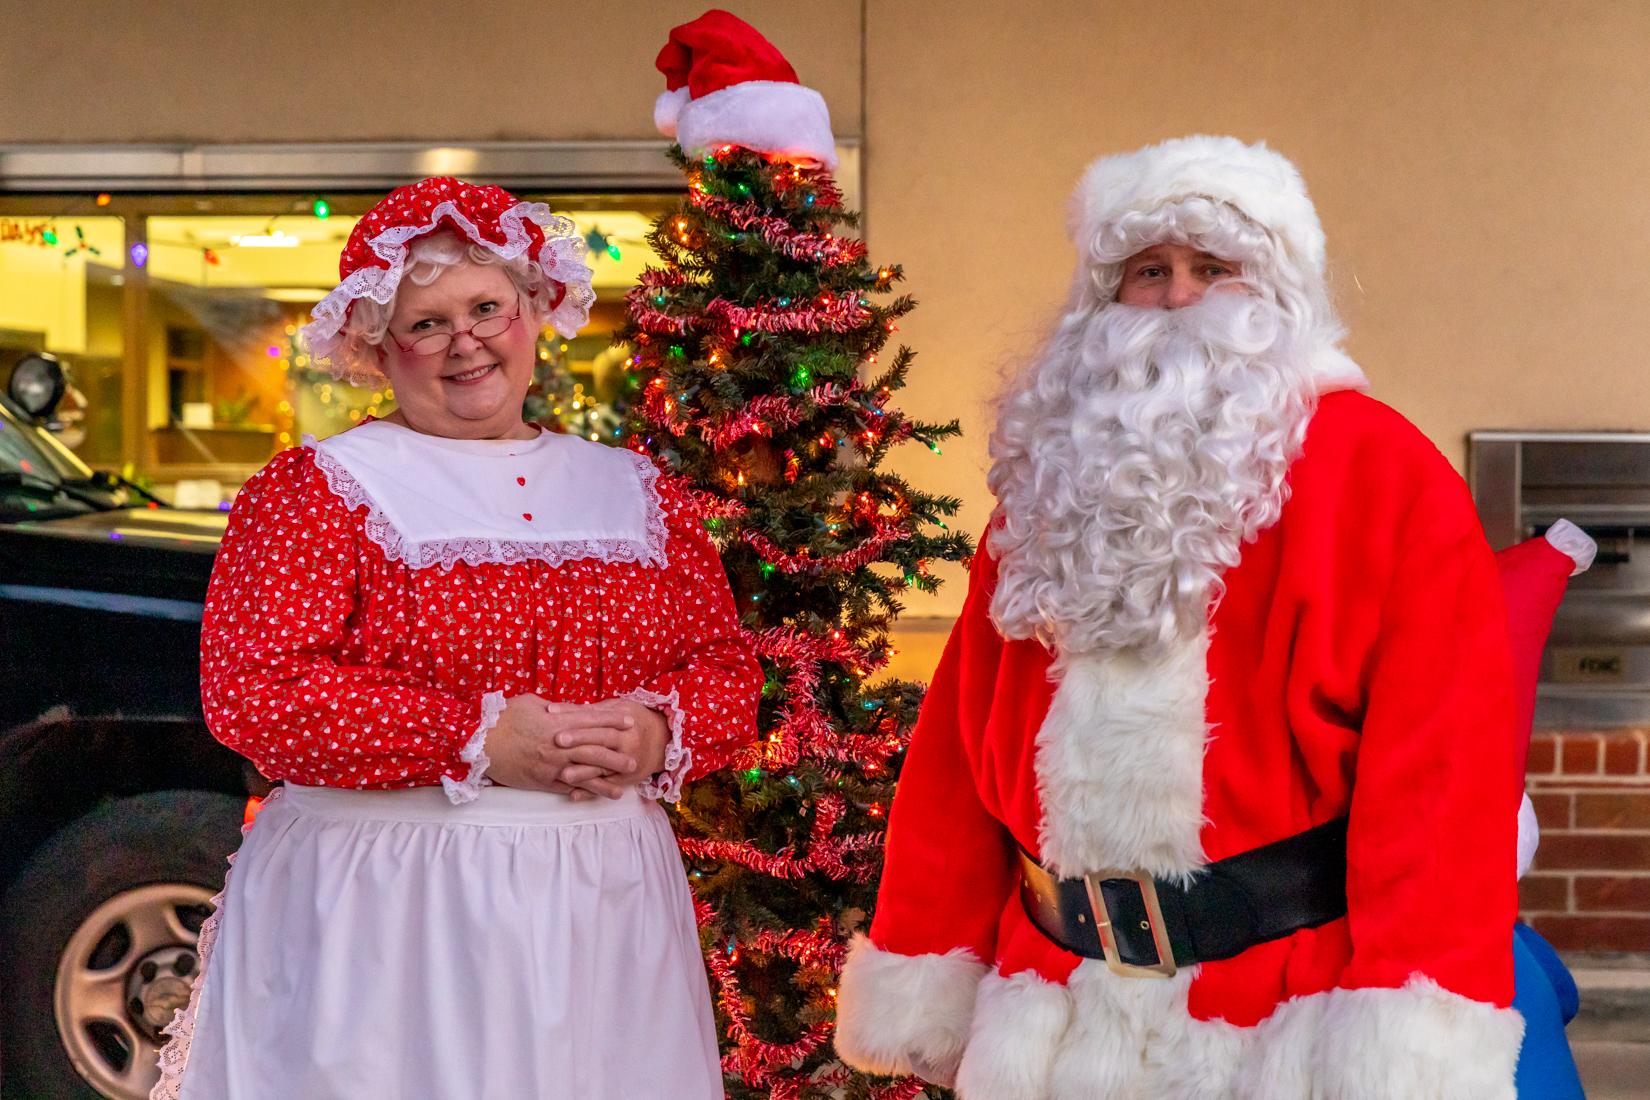 Santa and Mrs. Claus arrive at the bank!